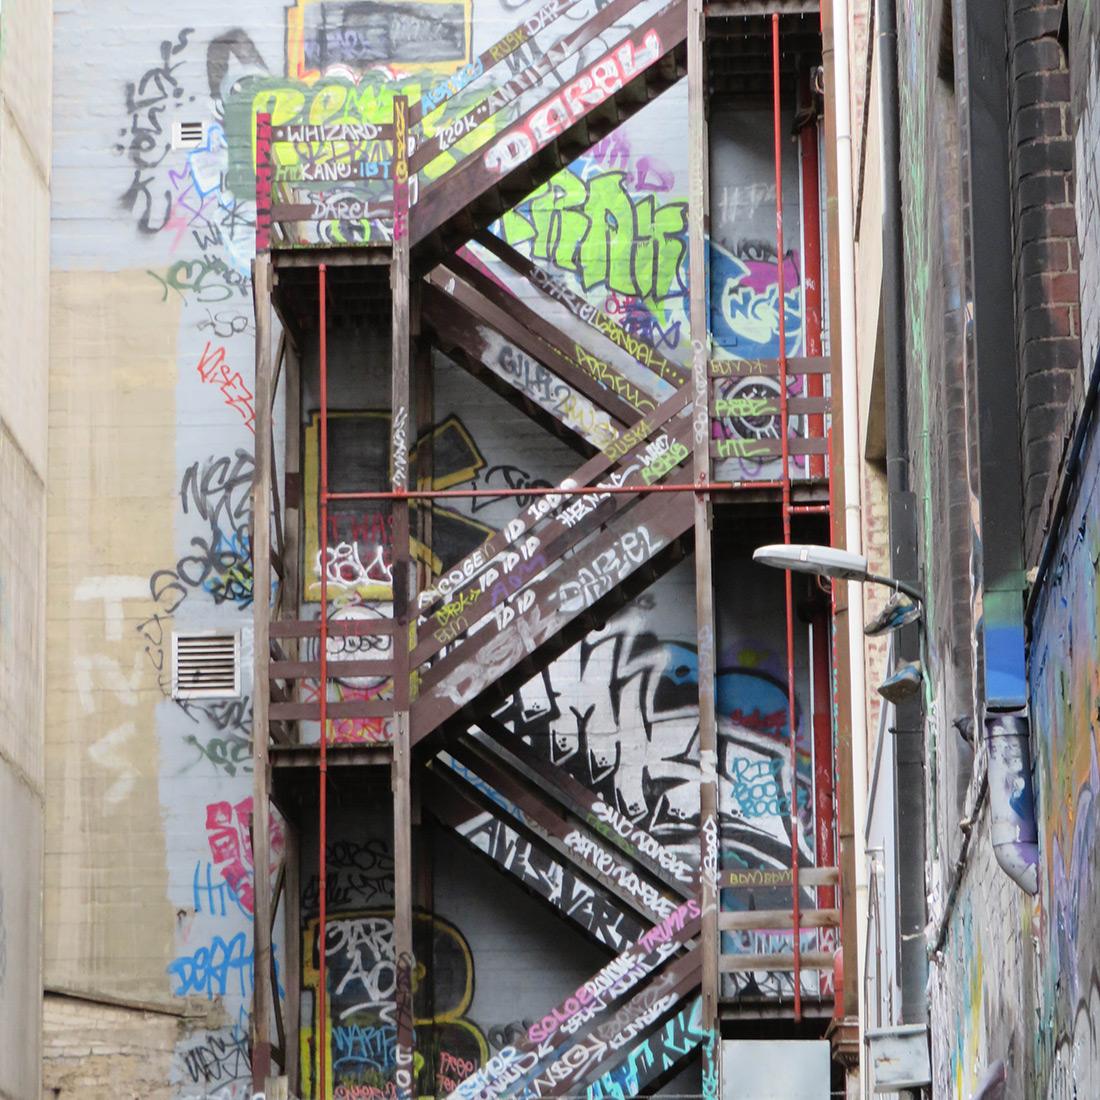 Melbourne Graffiti Street Art